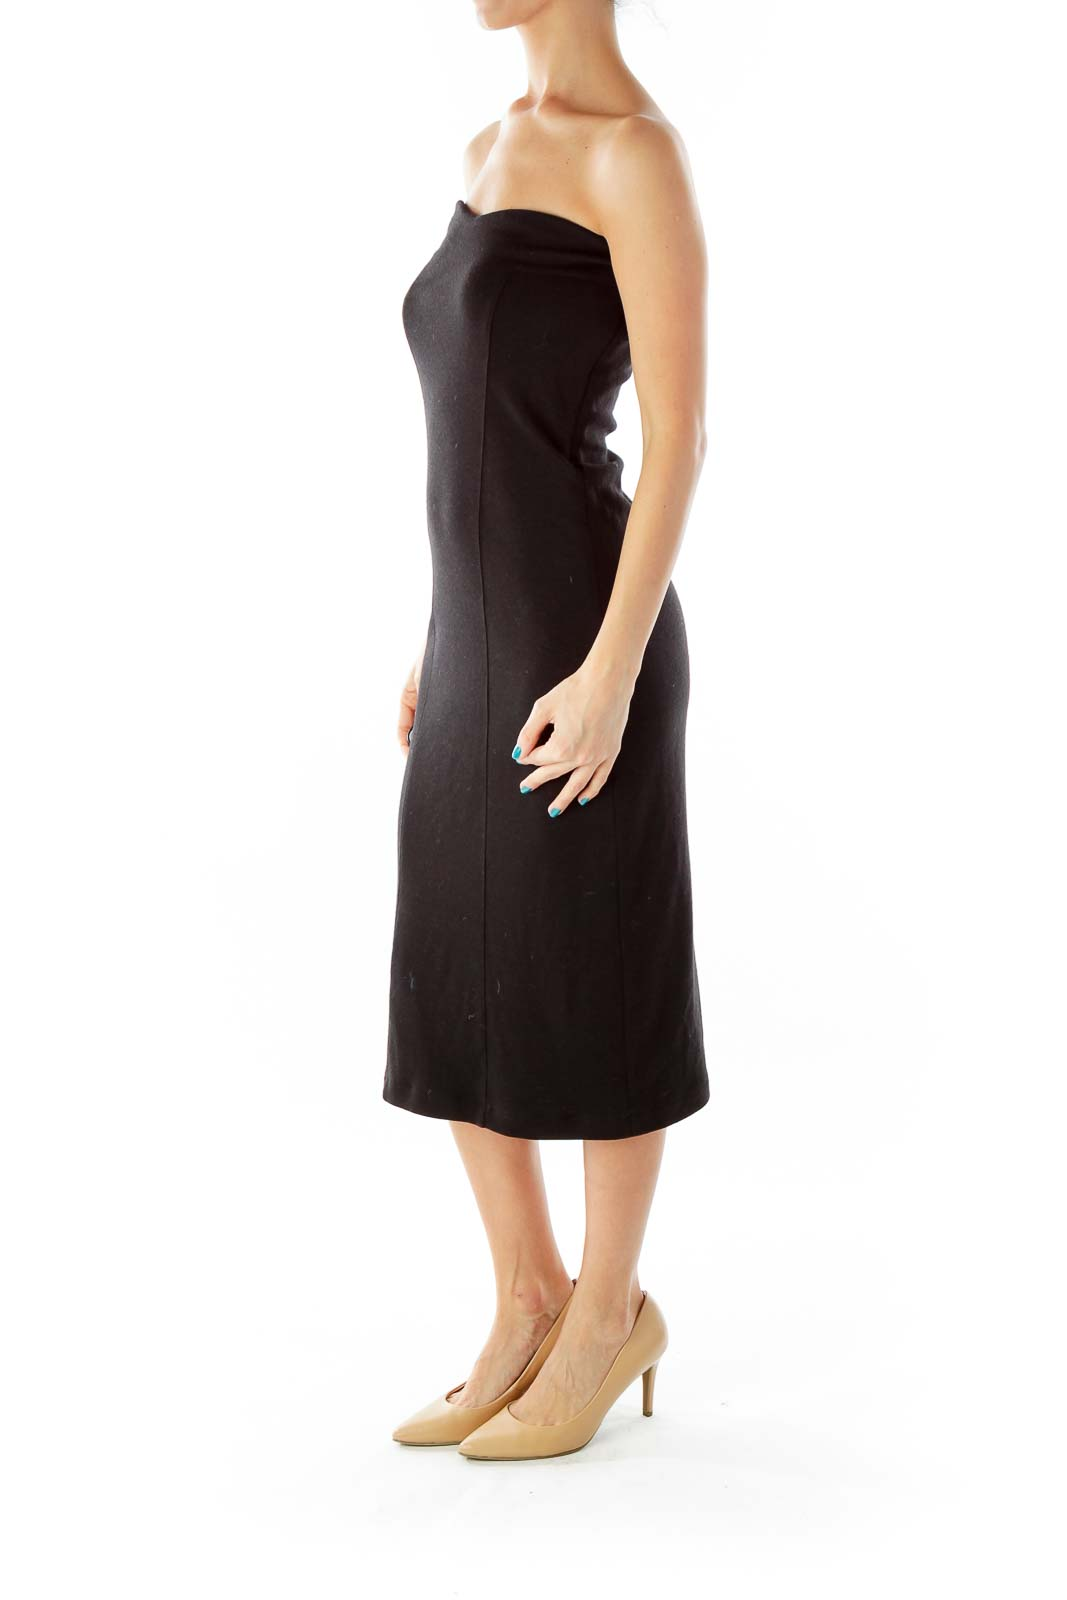 Black Strapless Cocktail Dress